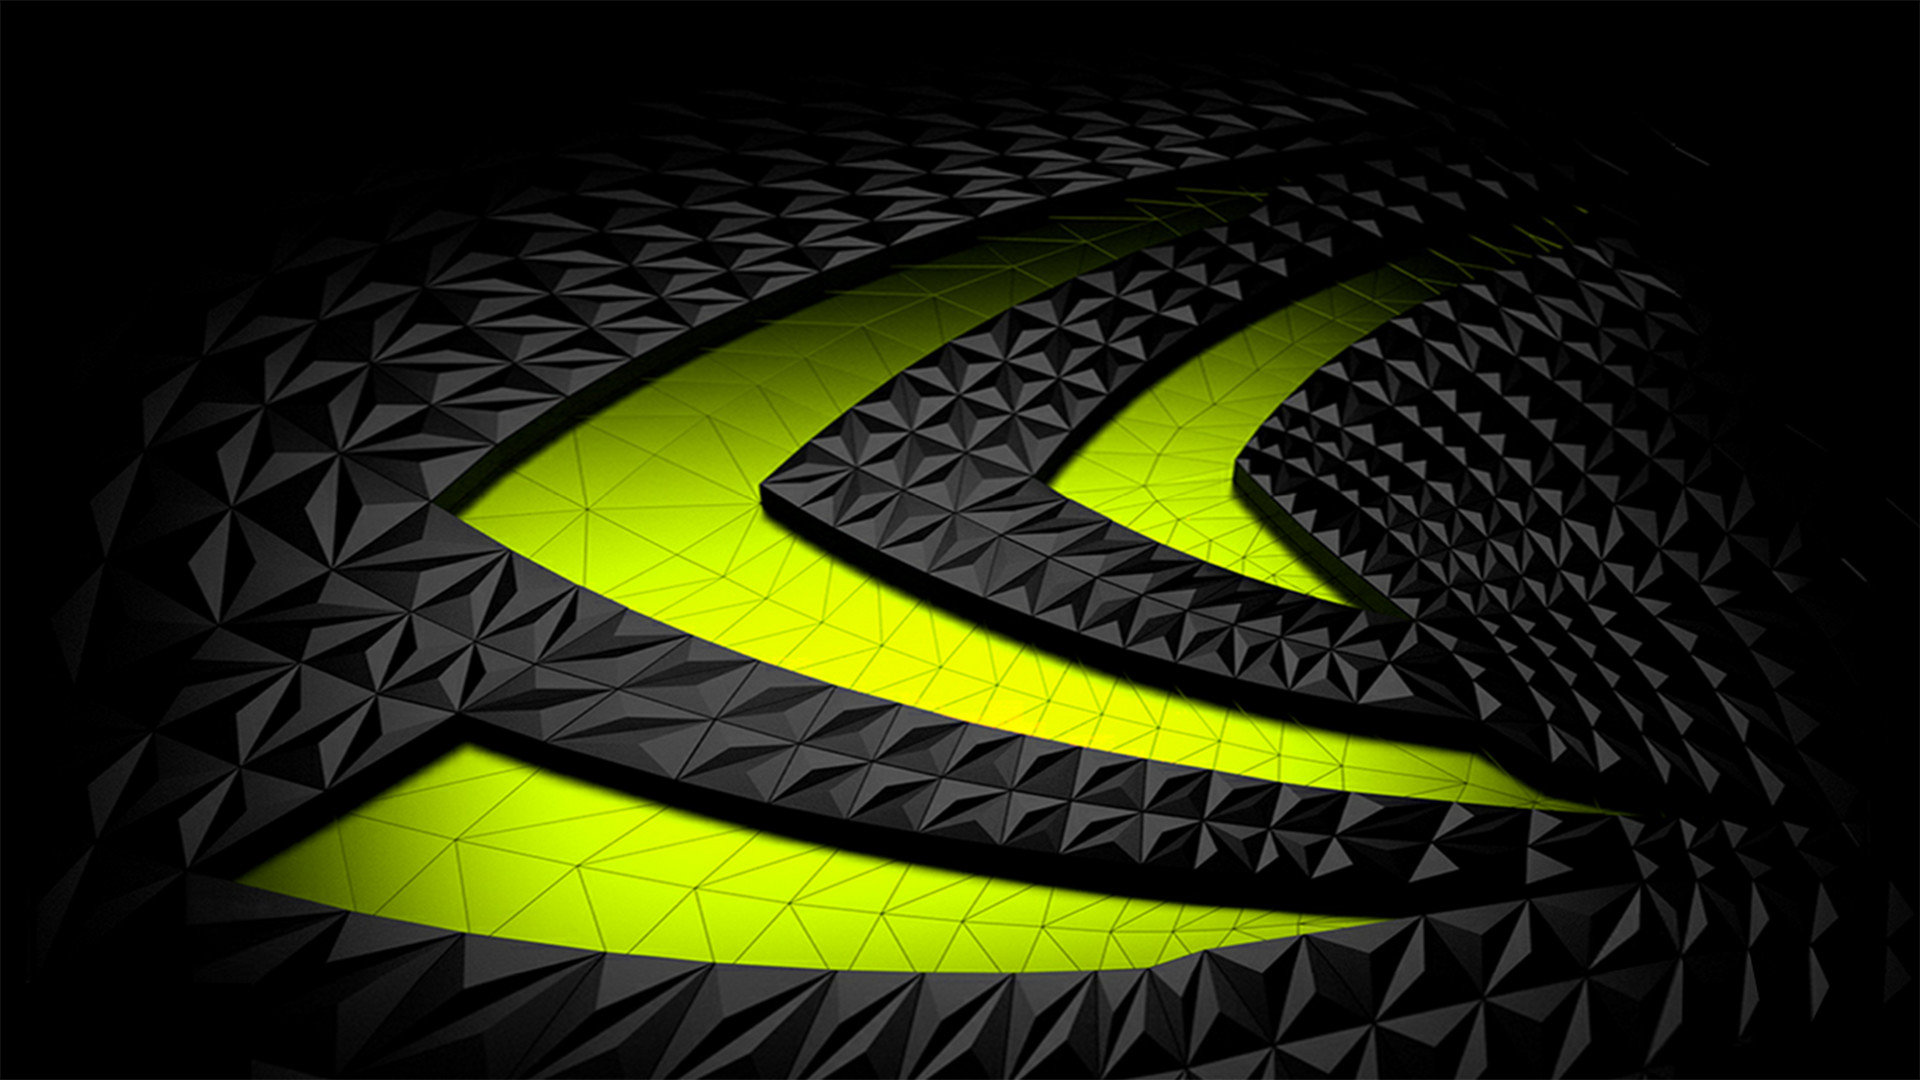 Nvidia wallpapers 1080p 81 images - 1920x1080 wallpaper nvidia ...